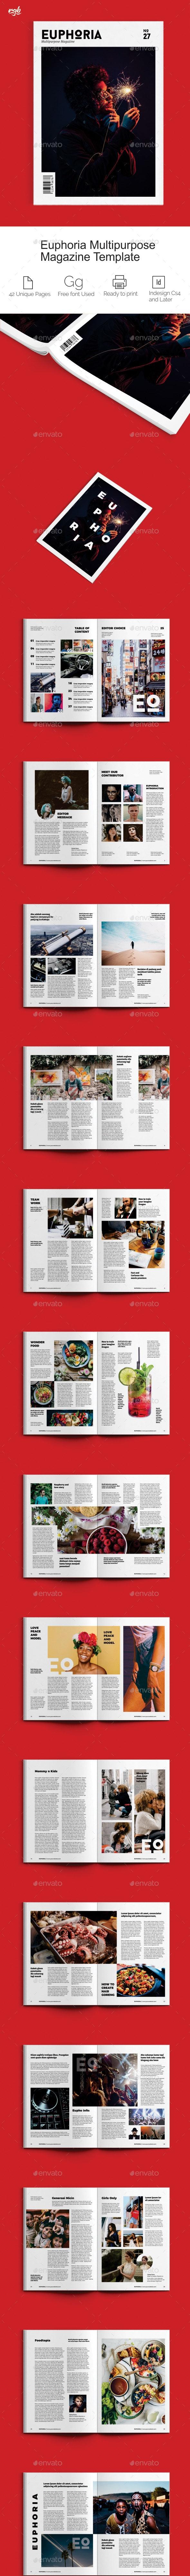 Euphoria Magazine - Magazines Print Templates